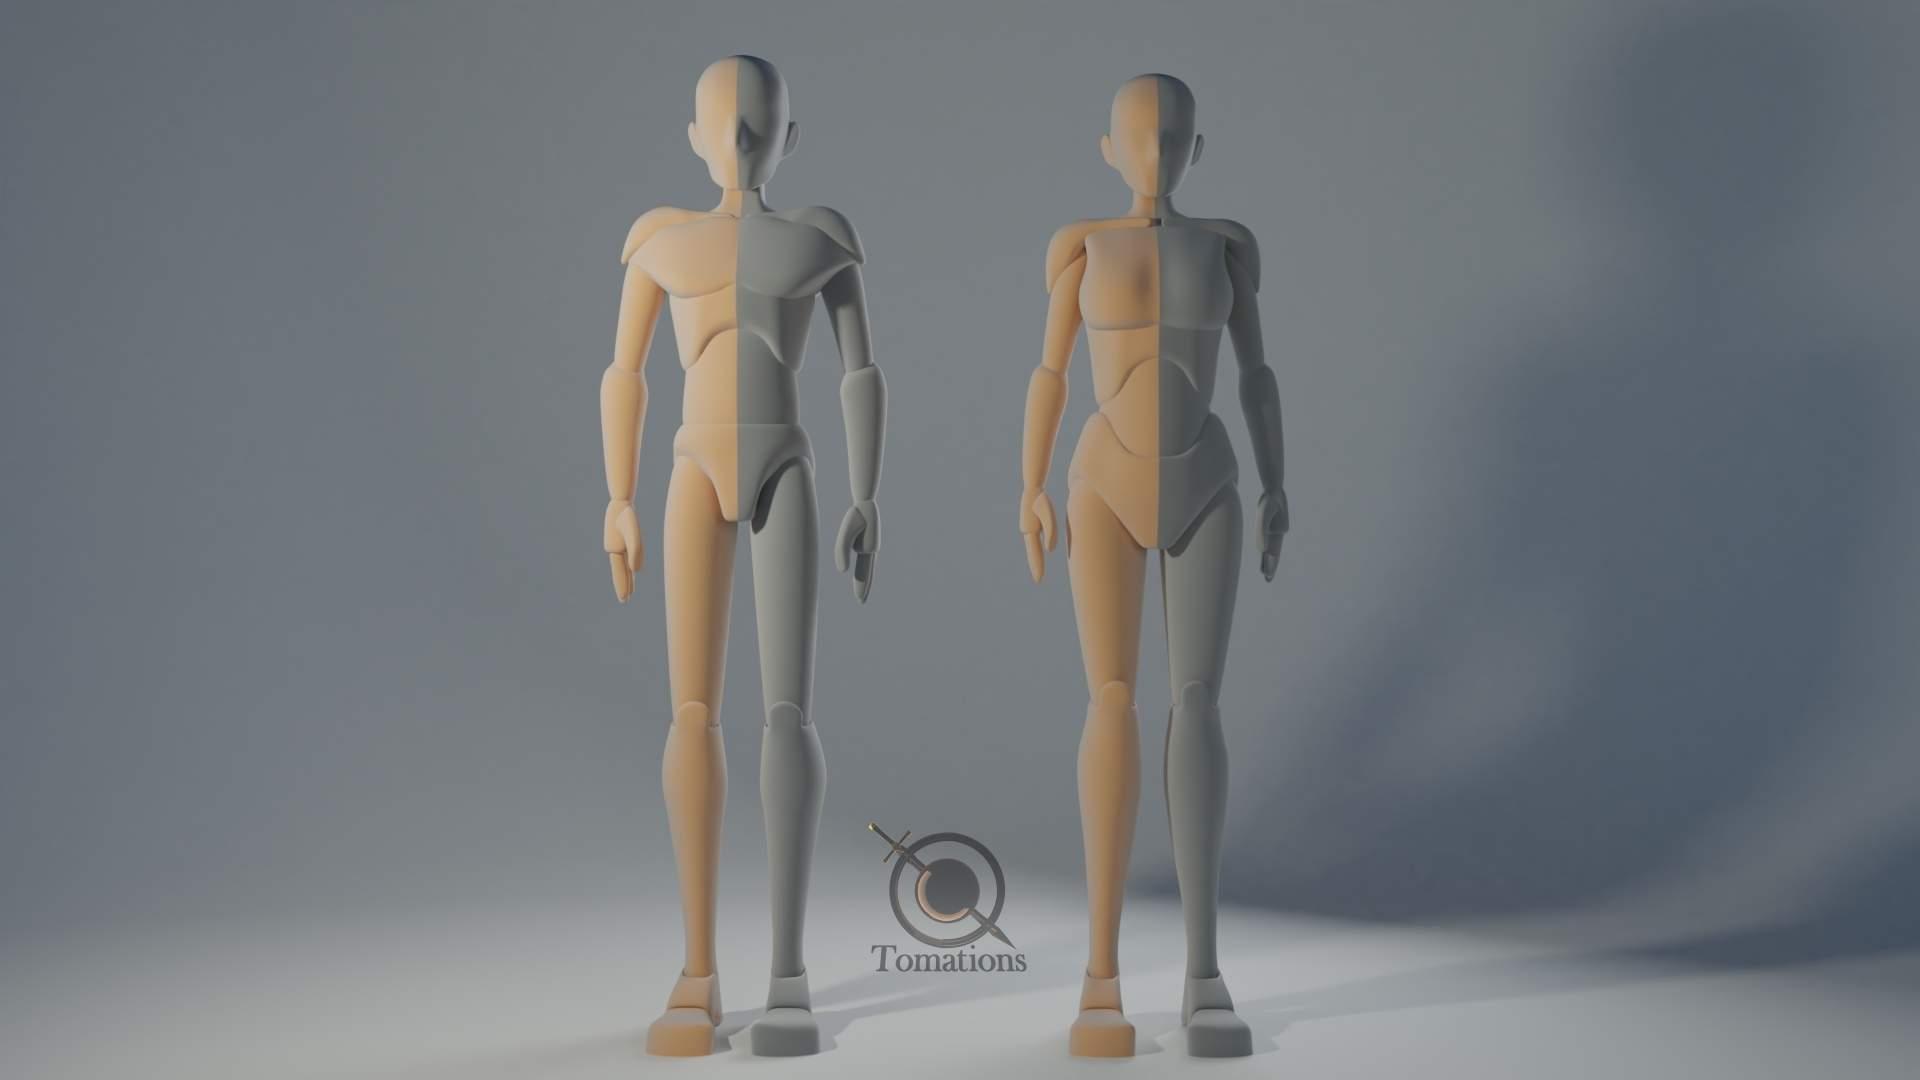 IK Rigged Dolls 3D Model